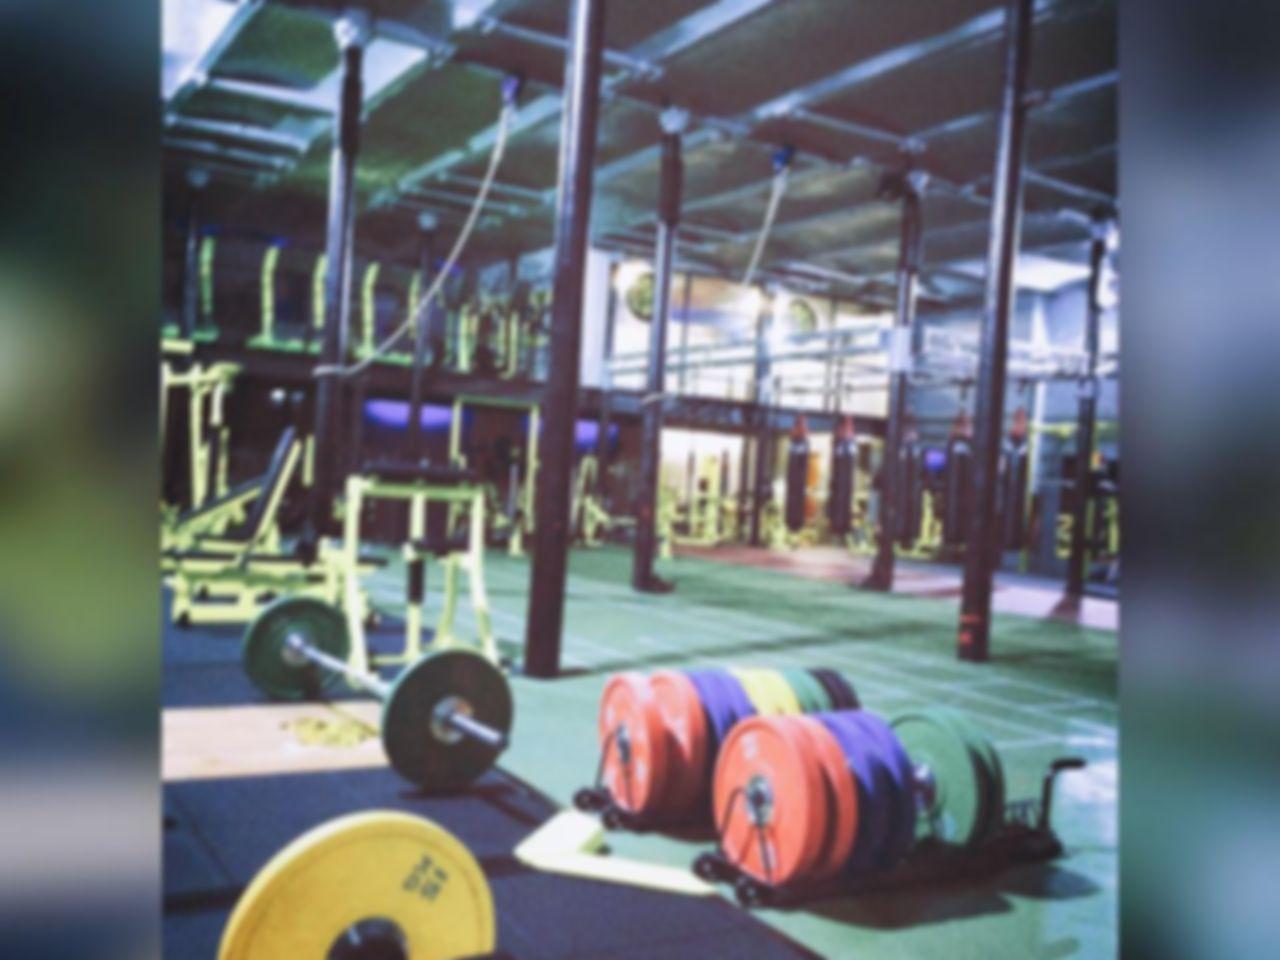 Elite Fitness Factory, Wigan, WN3   Hussle com